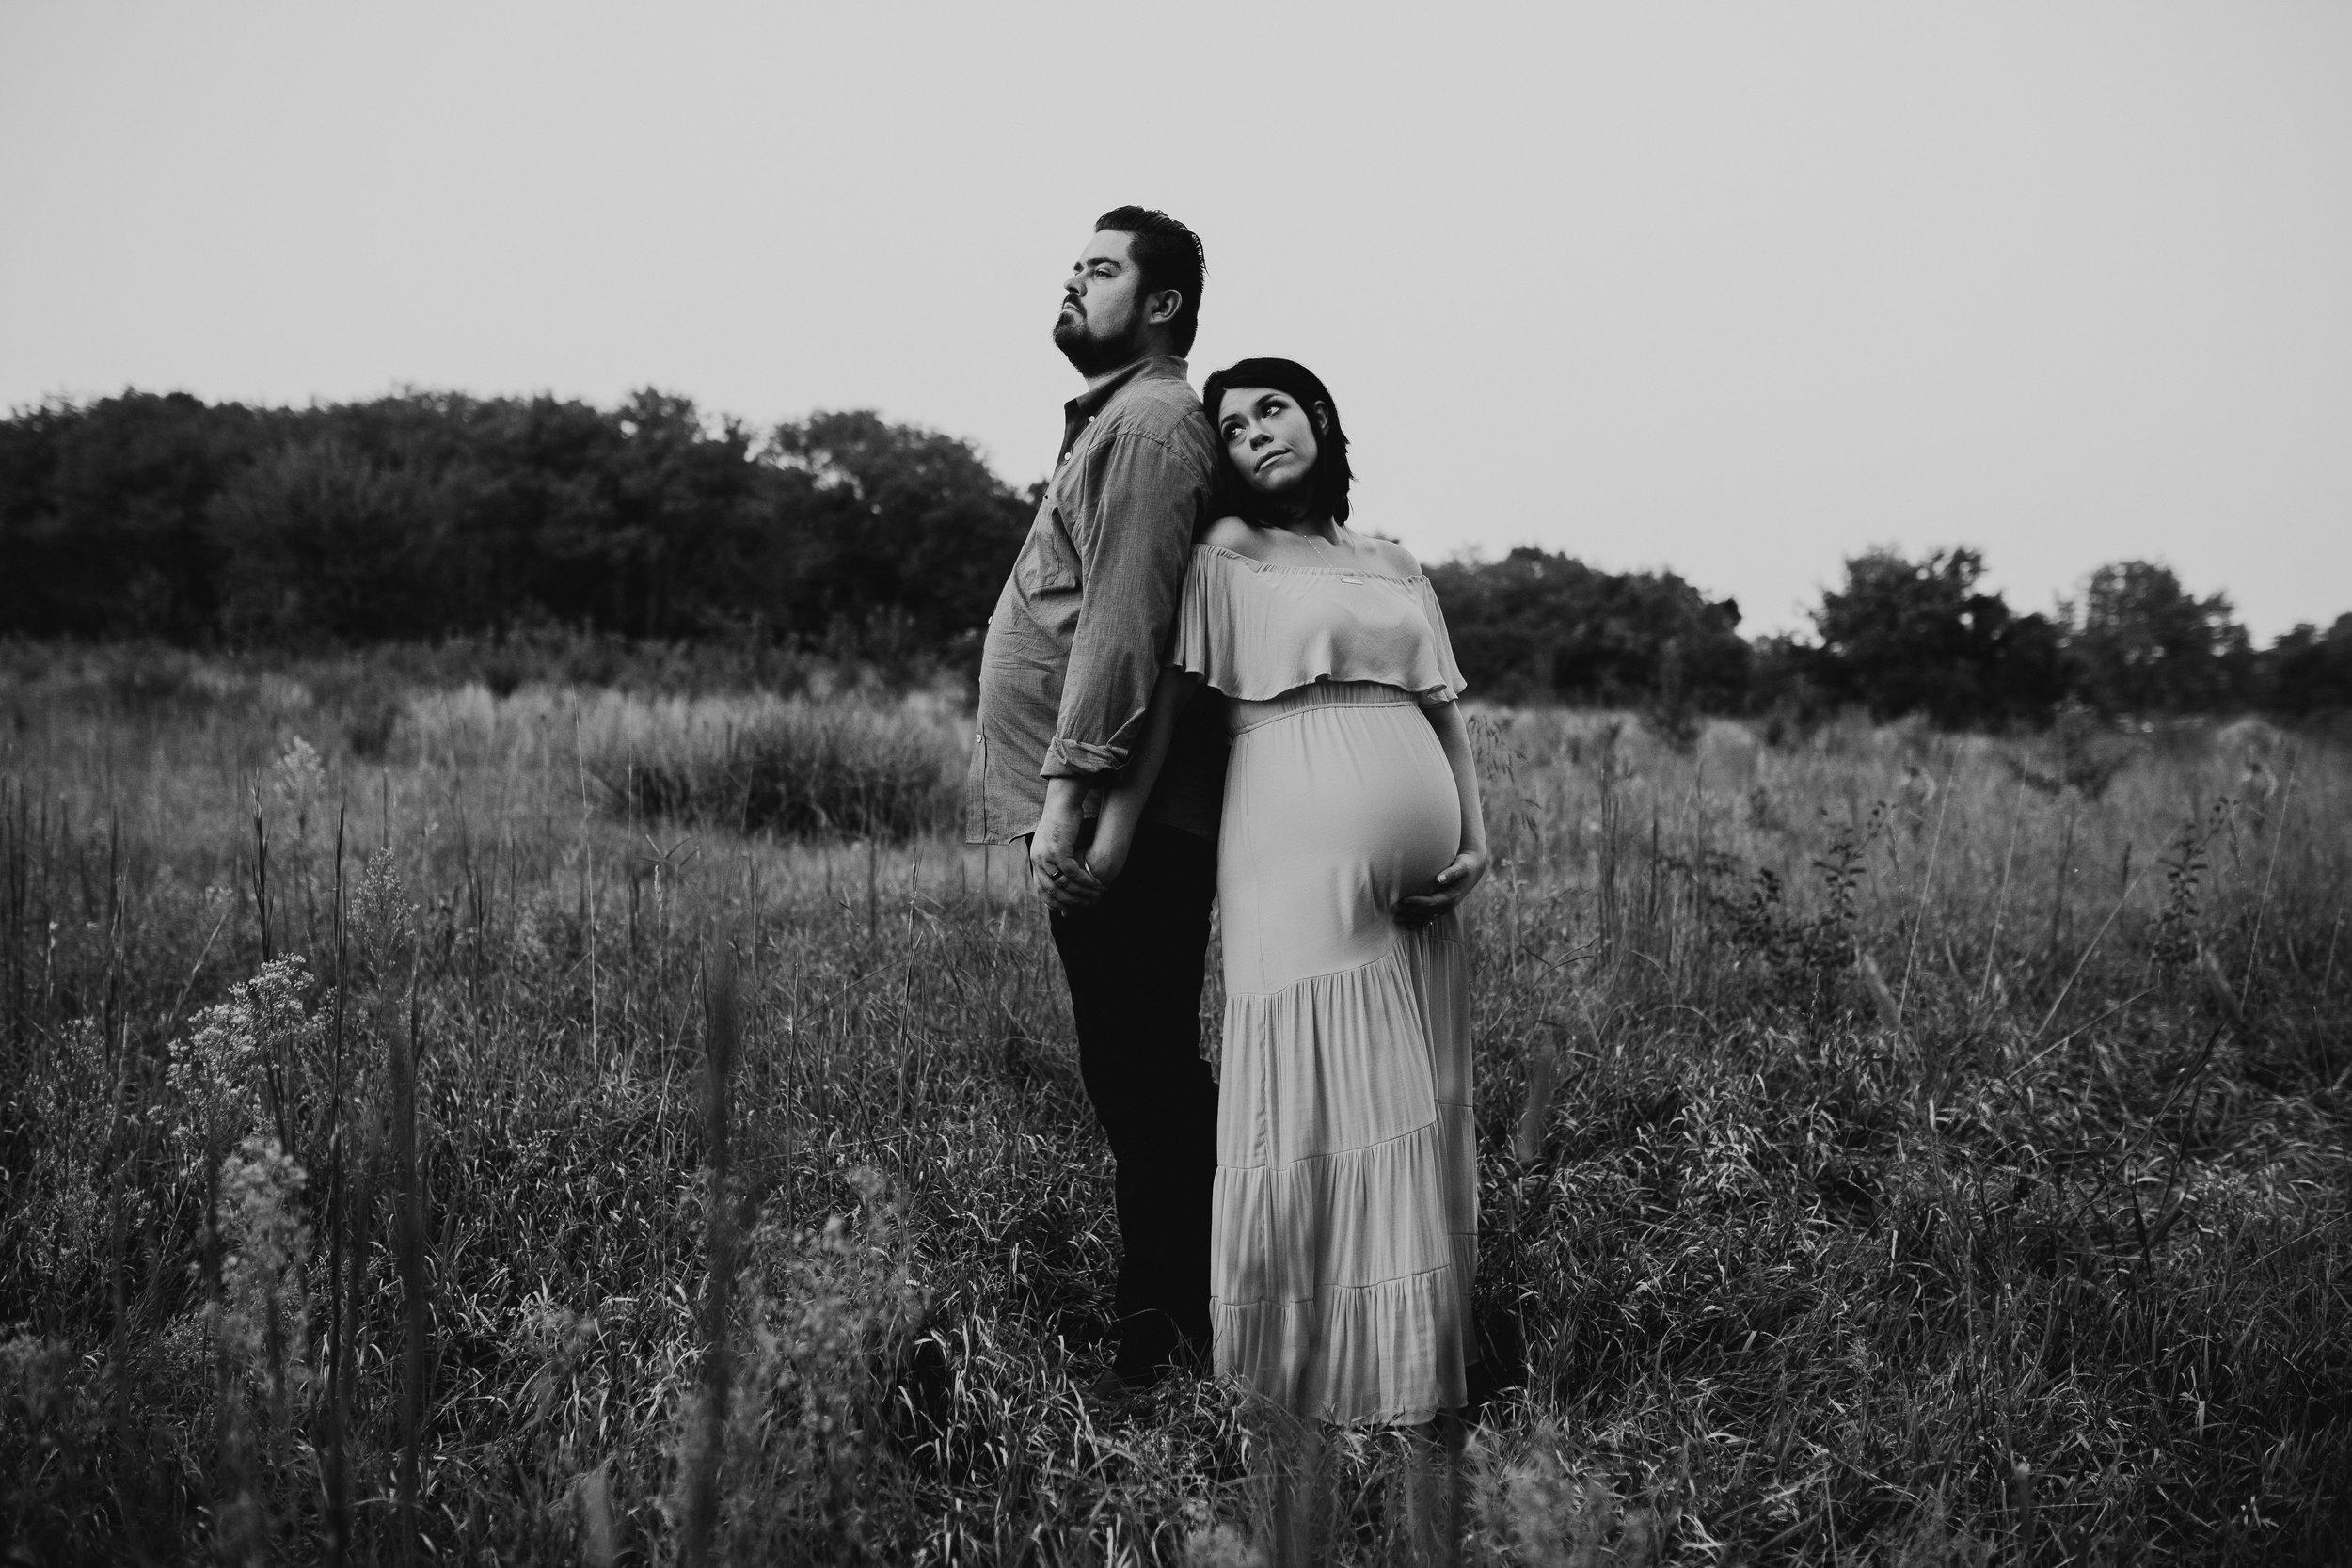 Alex-Maternity-Session-Jesse-Salter-Photography-110.jpg